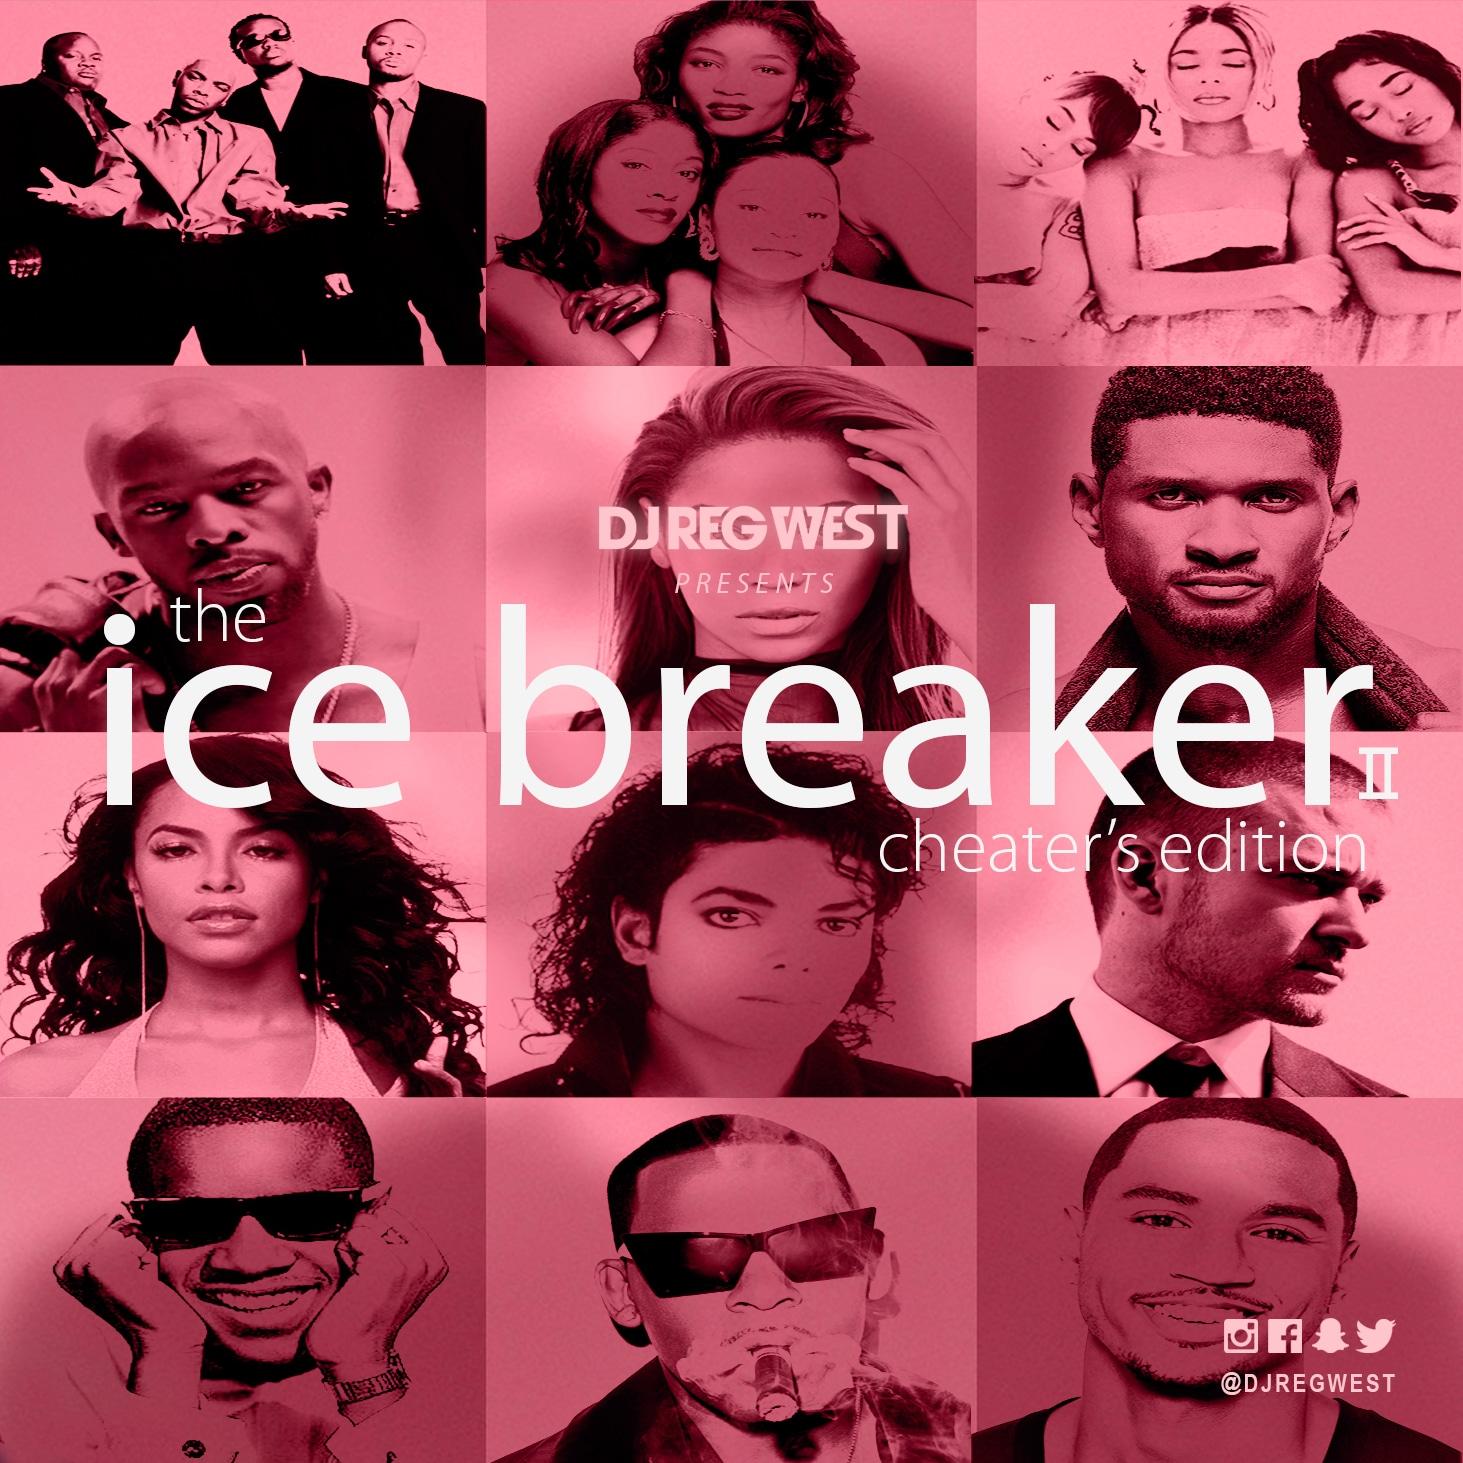 The Ice Breaker II: Cheater's Edition